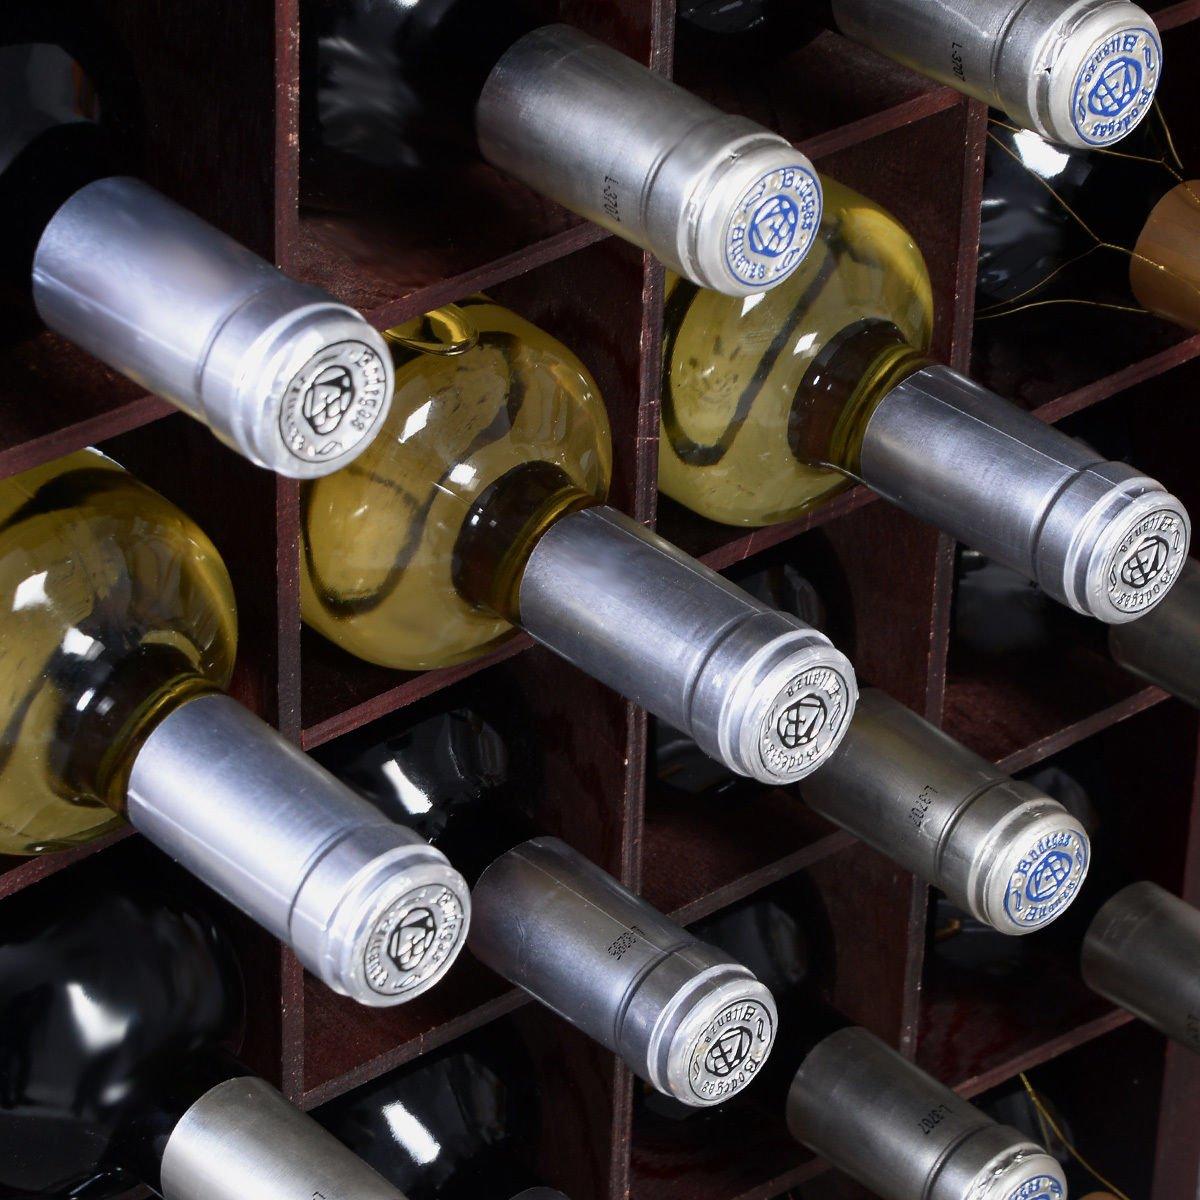 New Wine Wooden Cabinet Bottle Holder Storage Kitchen Home Bar w/ Glass Rack by Unknown (Image #6)